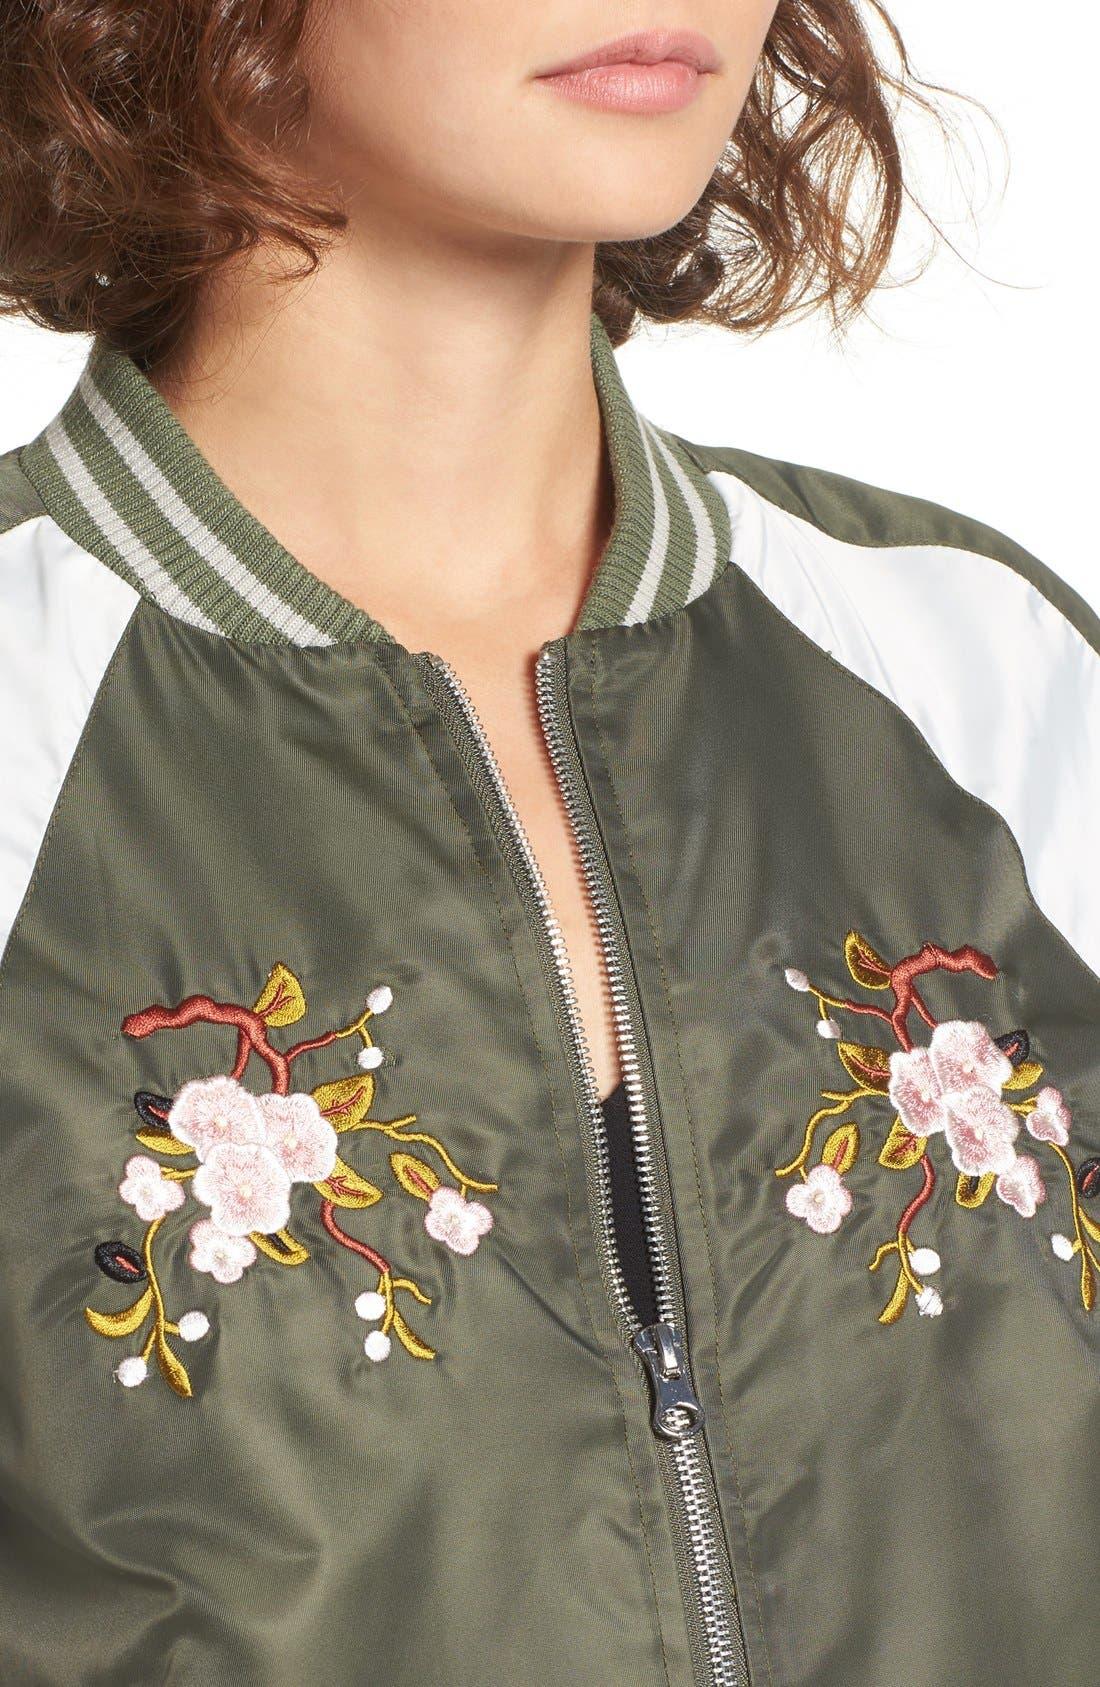 Embroidered Satin Bomber Jacket,                             Alternate thumbnail 4, color,                             310